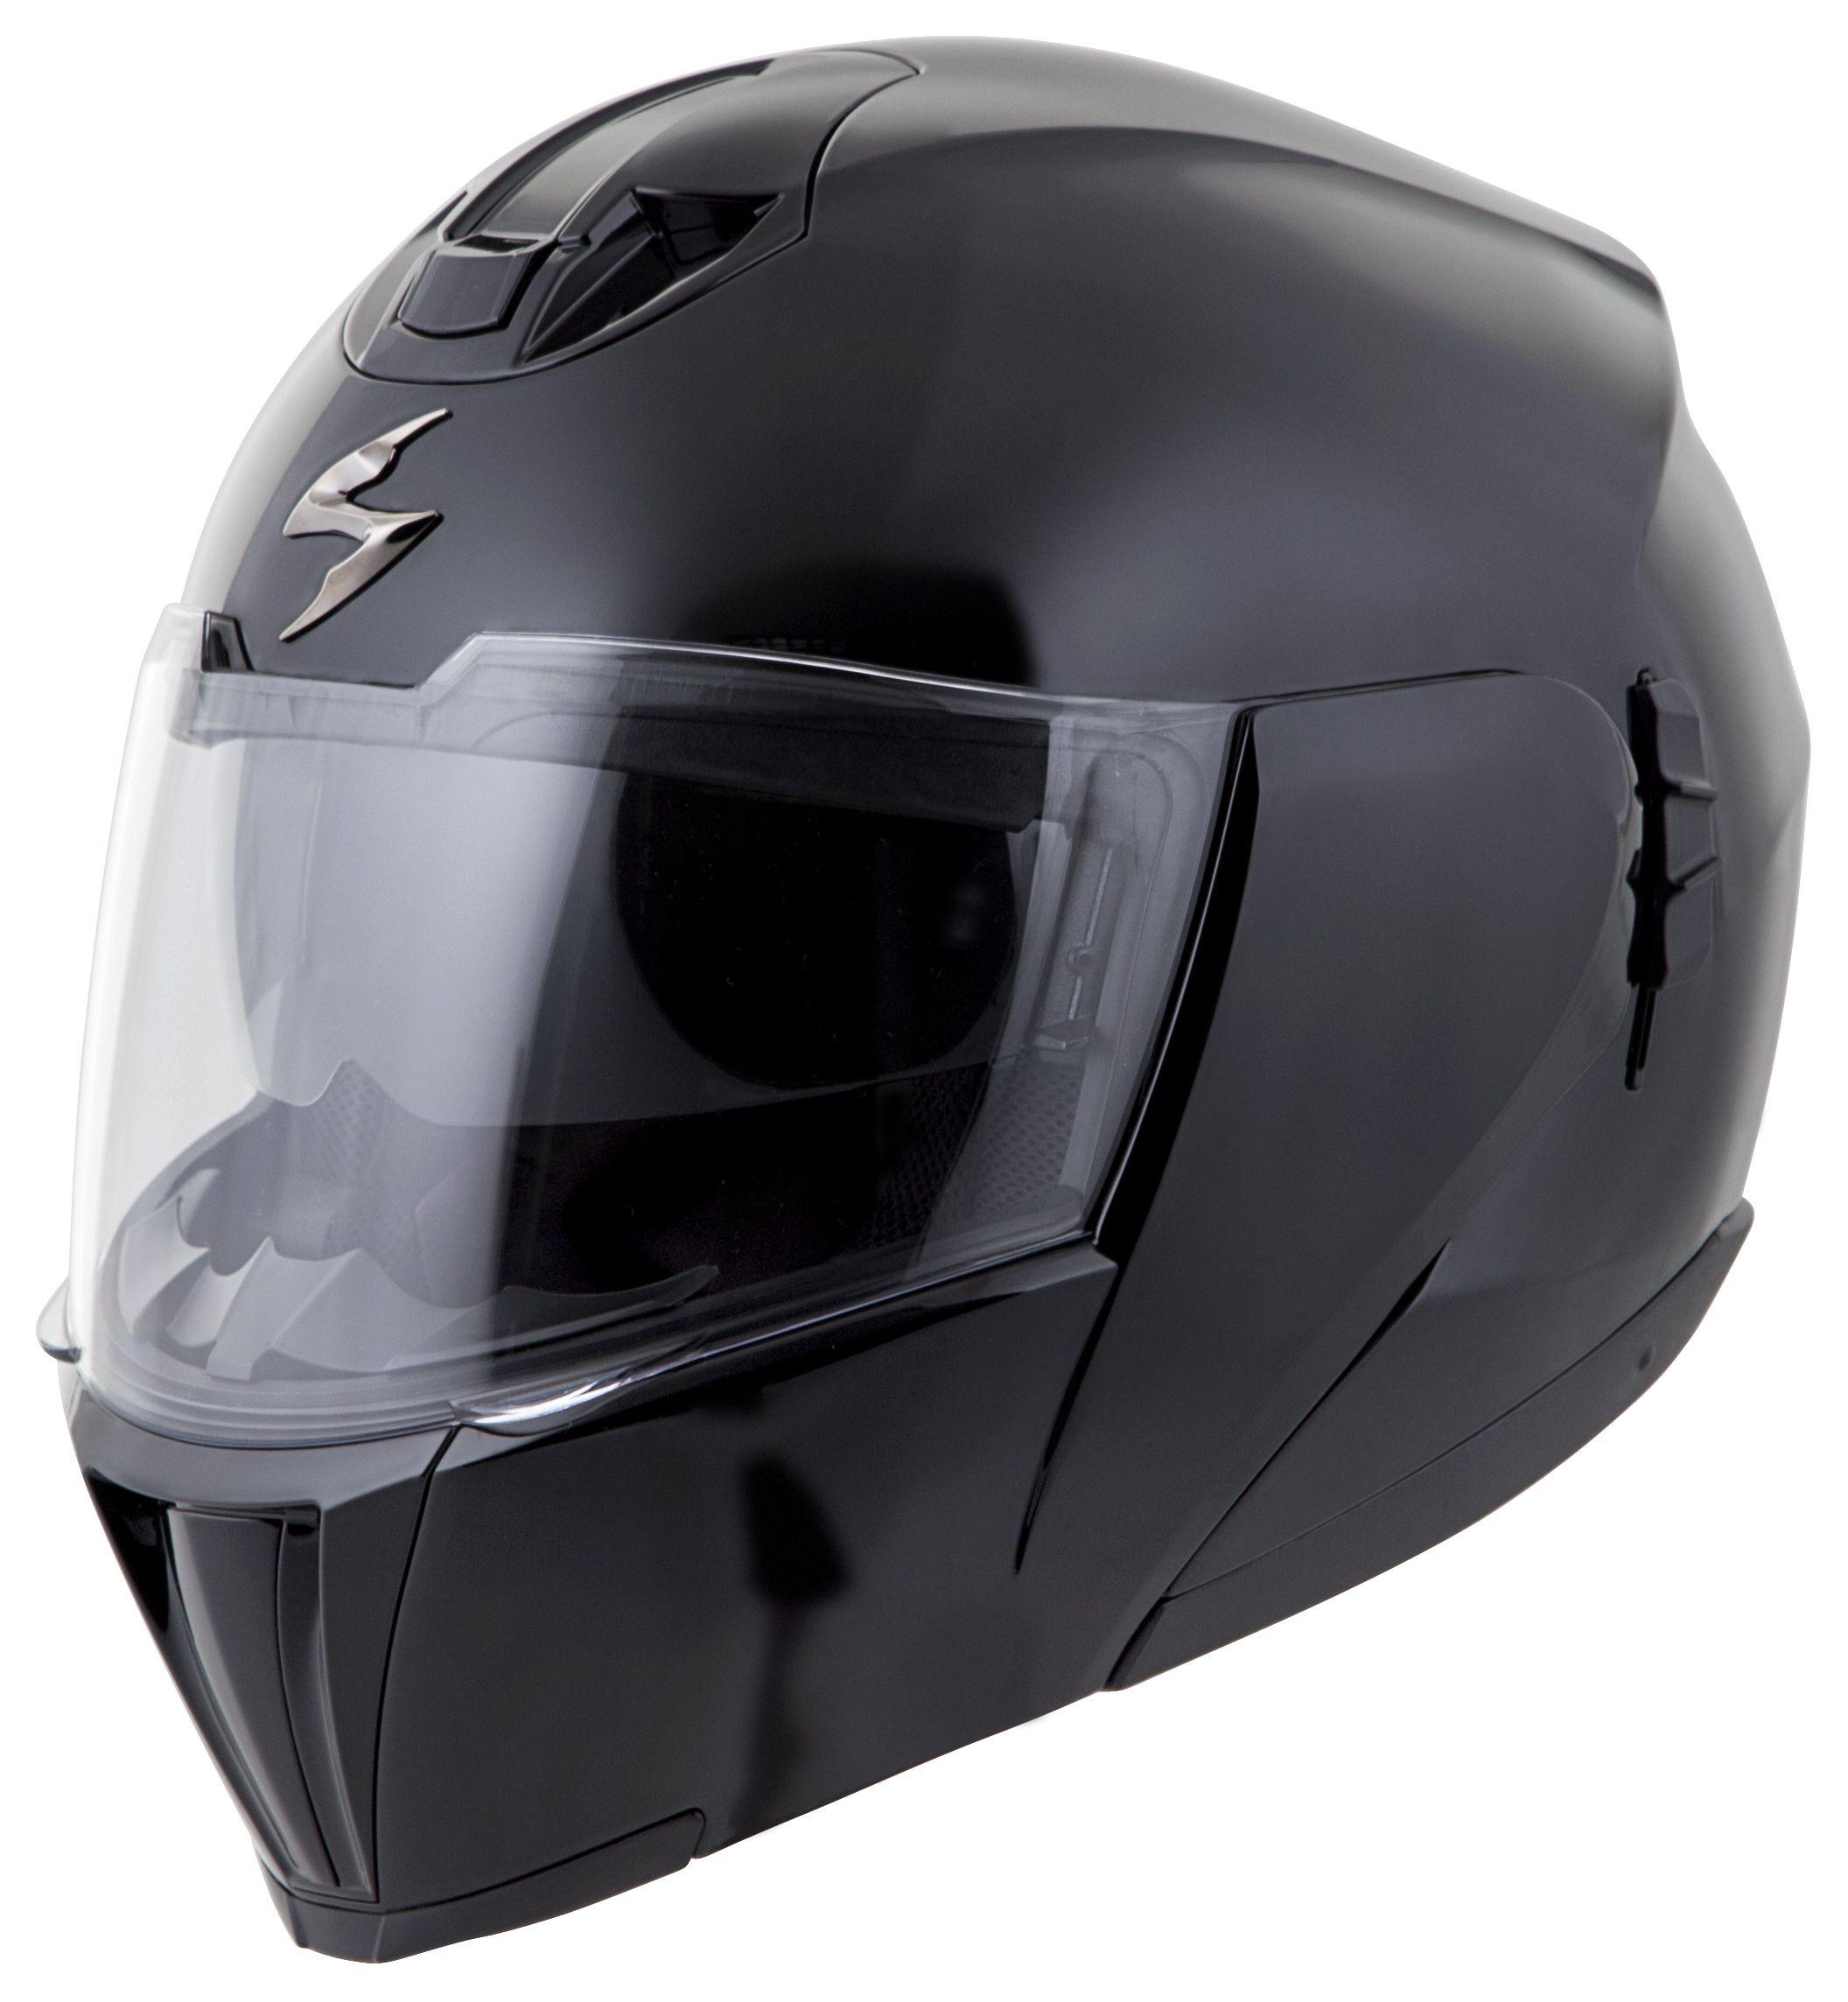 scorpion exo 900x helmet solid revzilla. Black Bedroom Furniture Sets. Home Design Ideas